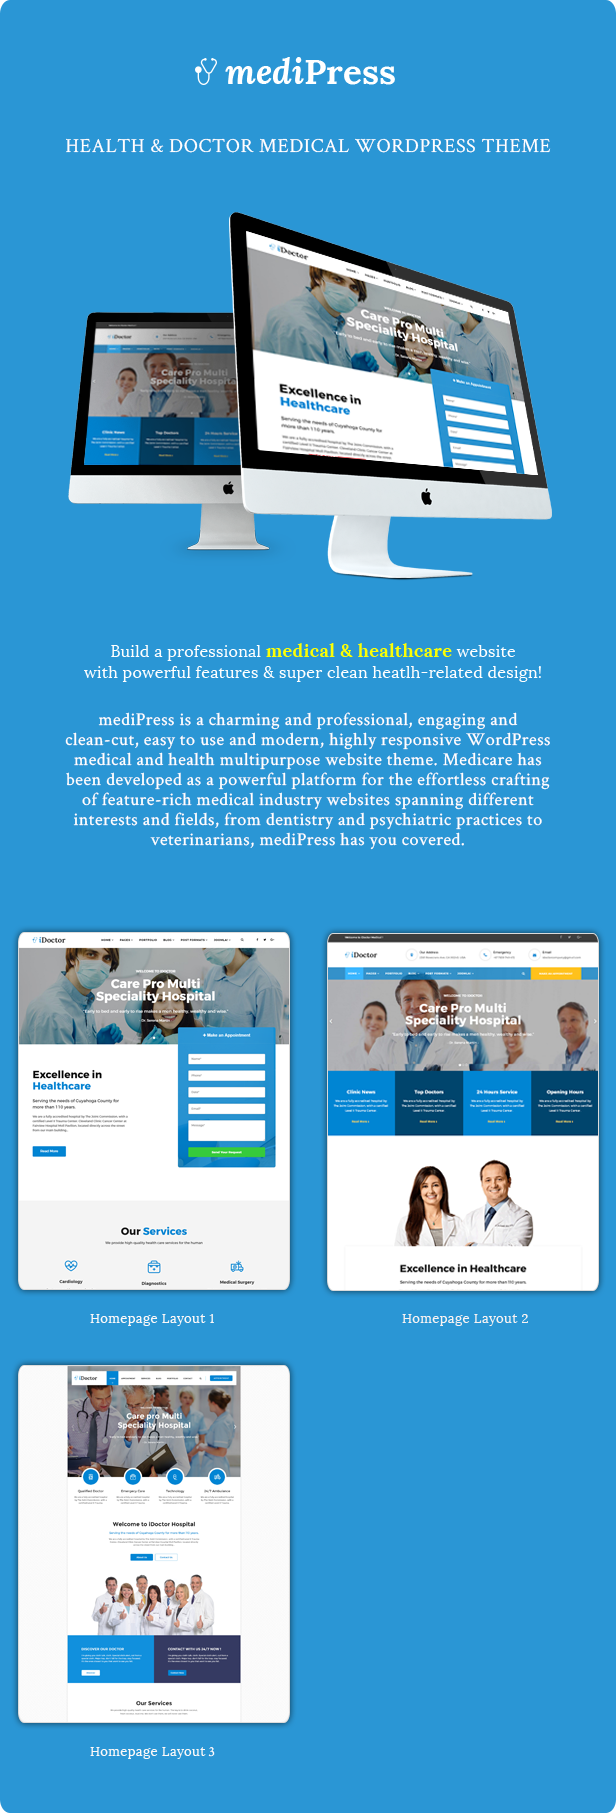 mediPress - Health and Doctor Medical WordPress Theme - 2